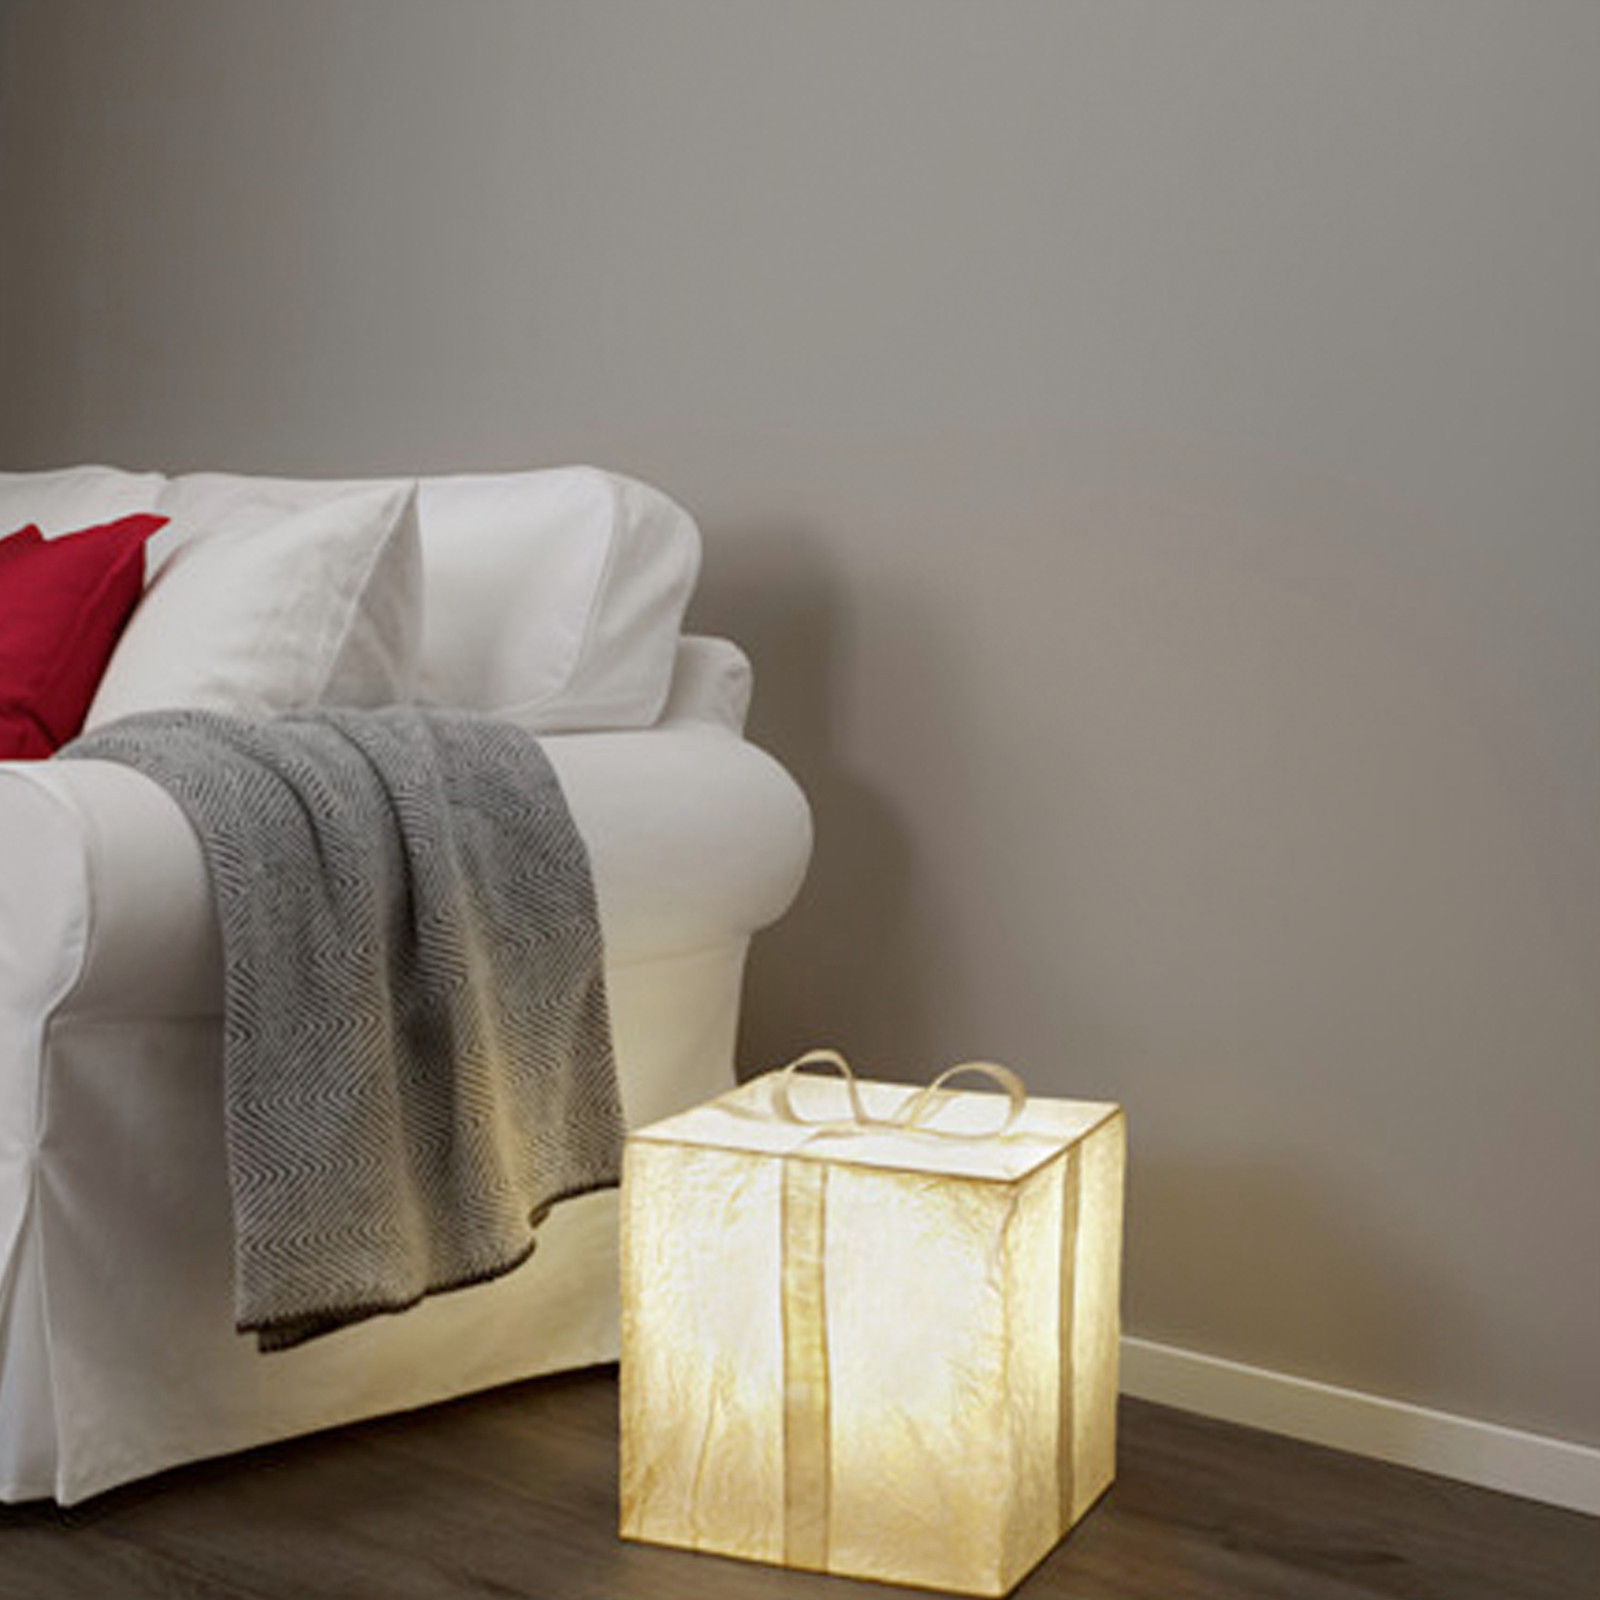 Ikea strala schachtel geschenk lampe led tischleuchte for Ikea dekoration